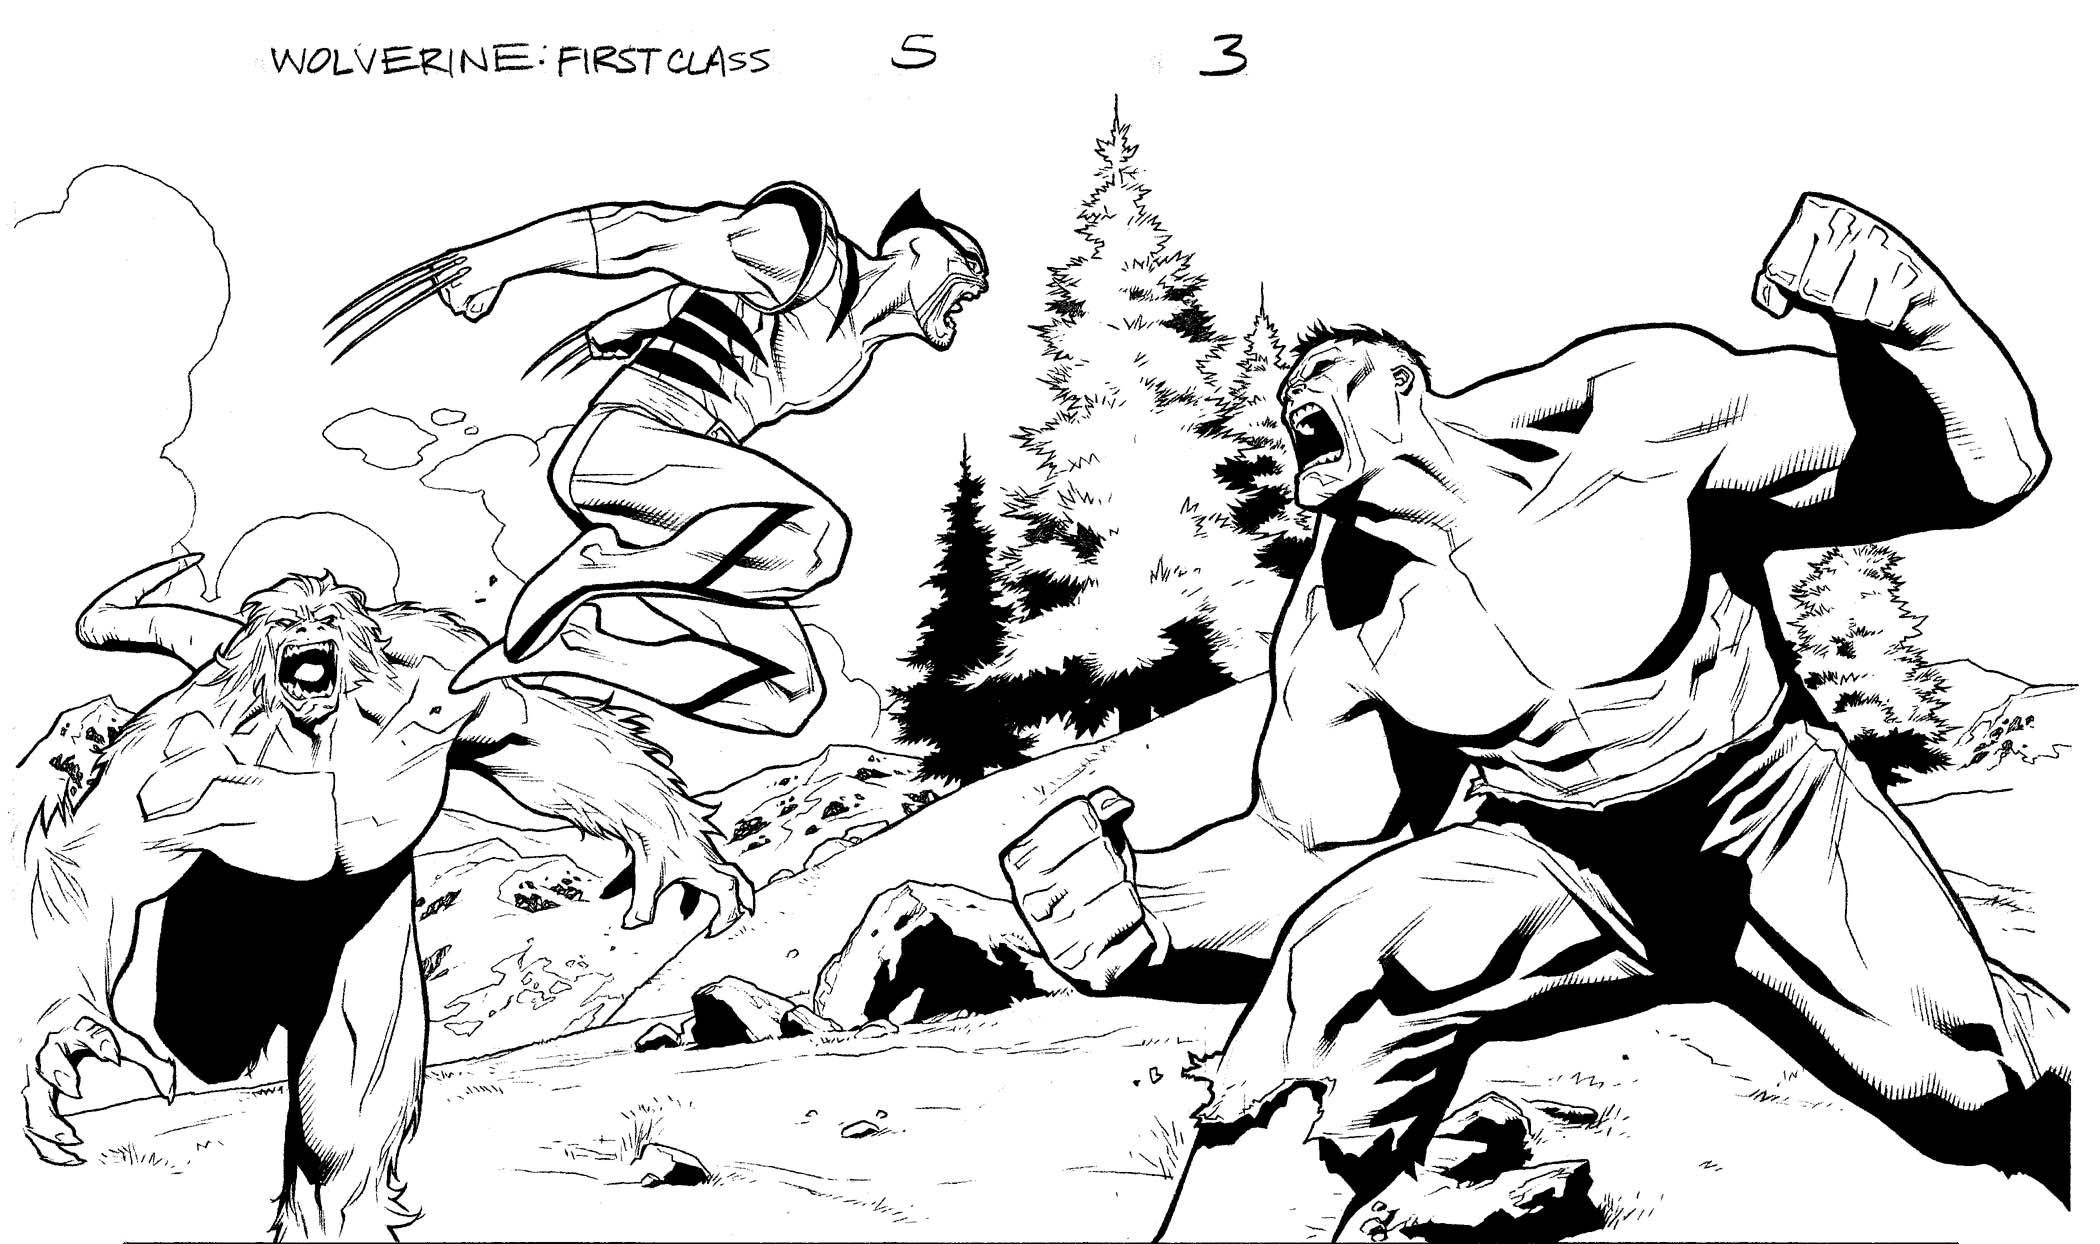 Coloring pages wolverine x men - Wolverine Vs Hulk Vs Wendigo By Clayton Henry